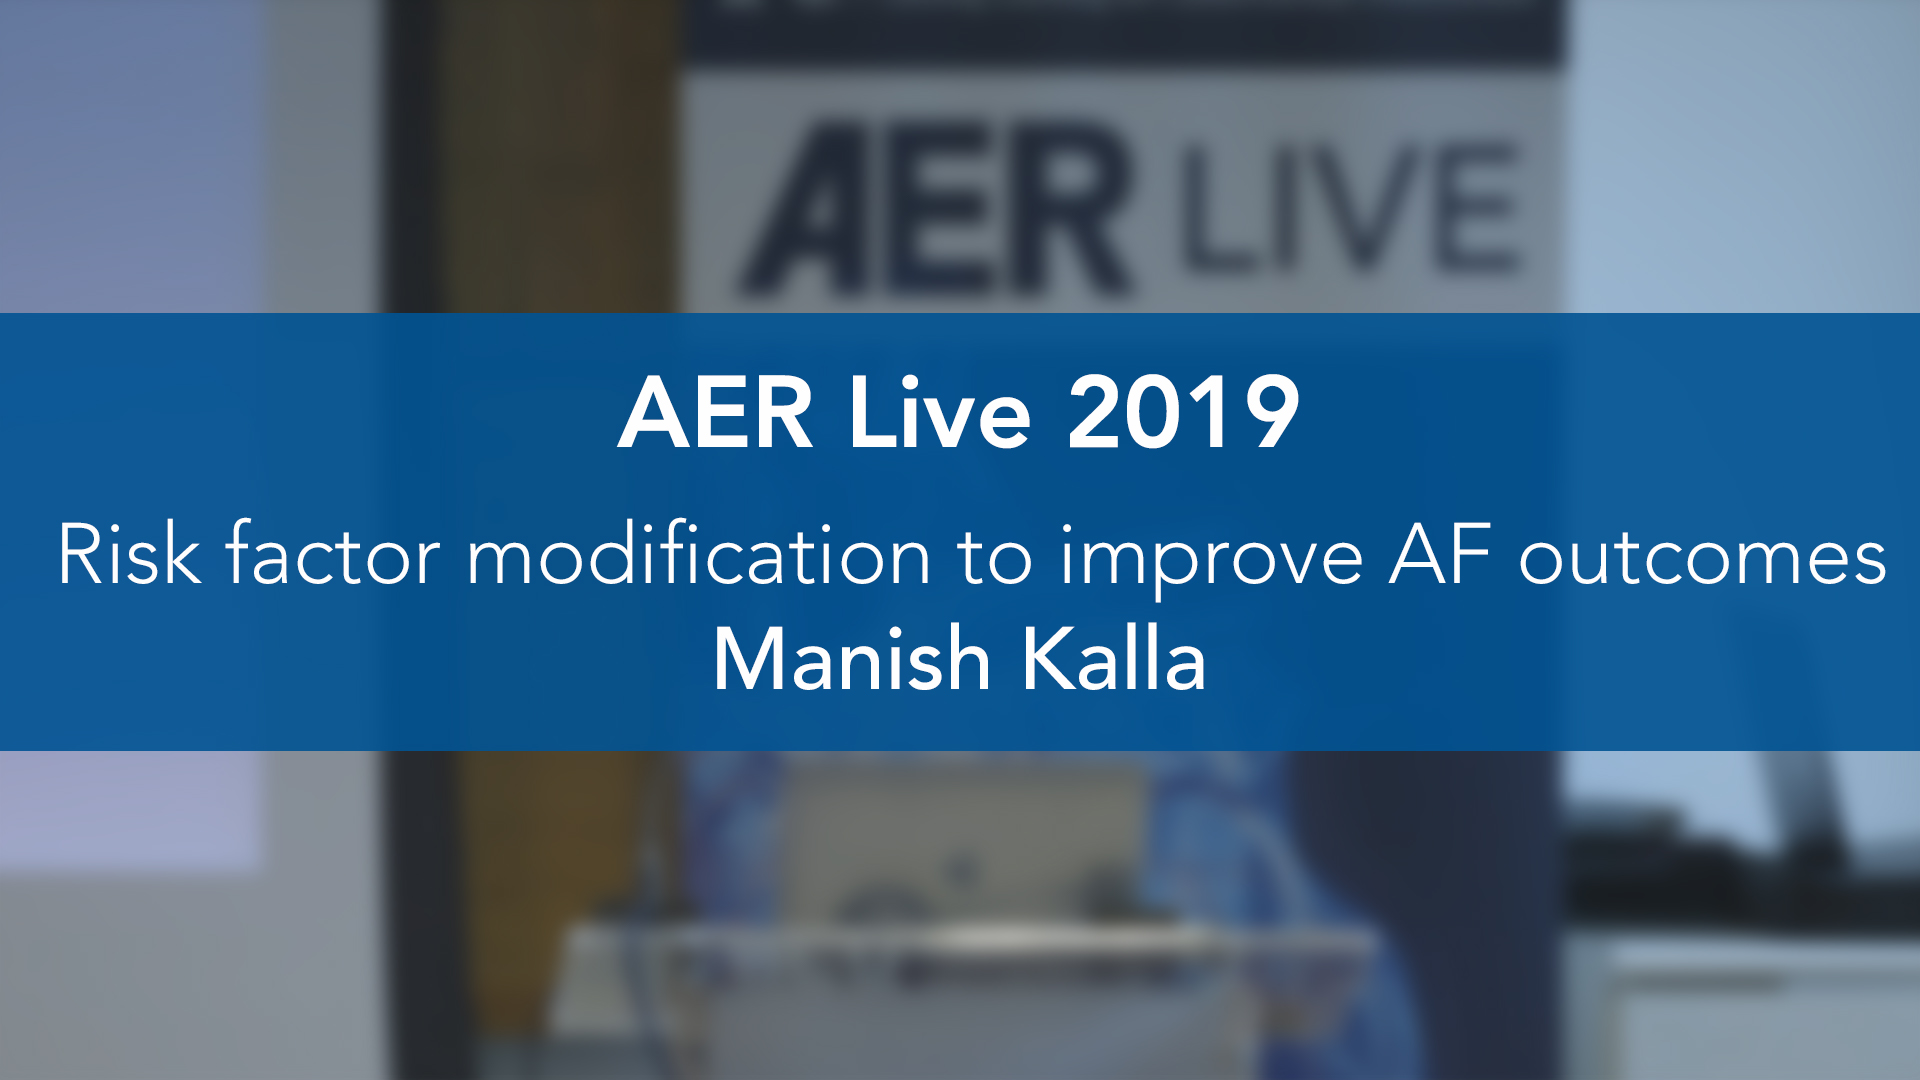 AER: LIVE 2019: Risk factor modification to improve AF outcomes — Dr Manish Kalla